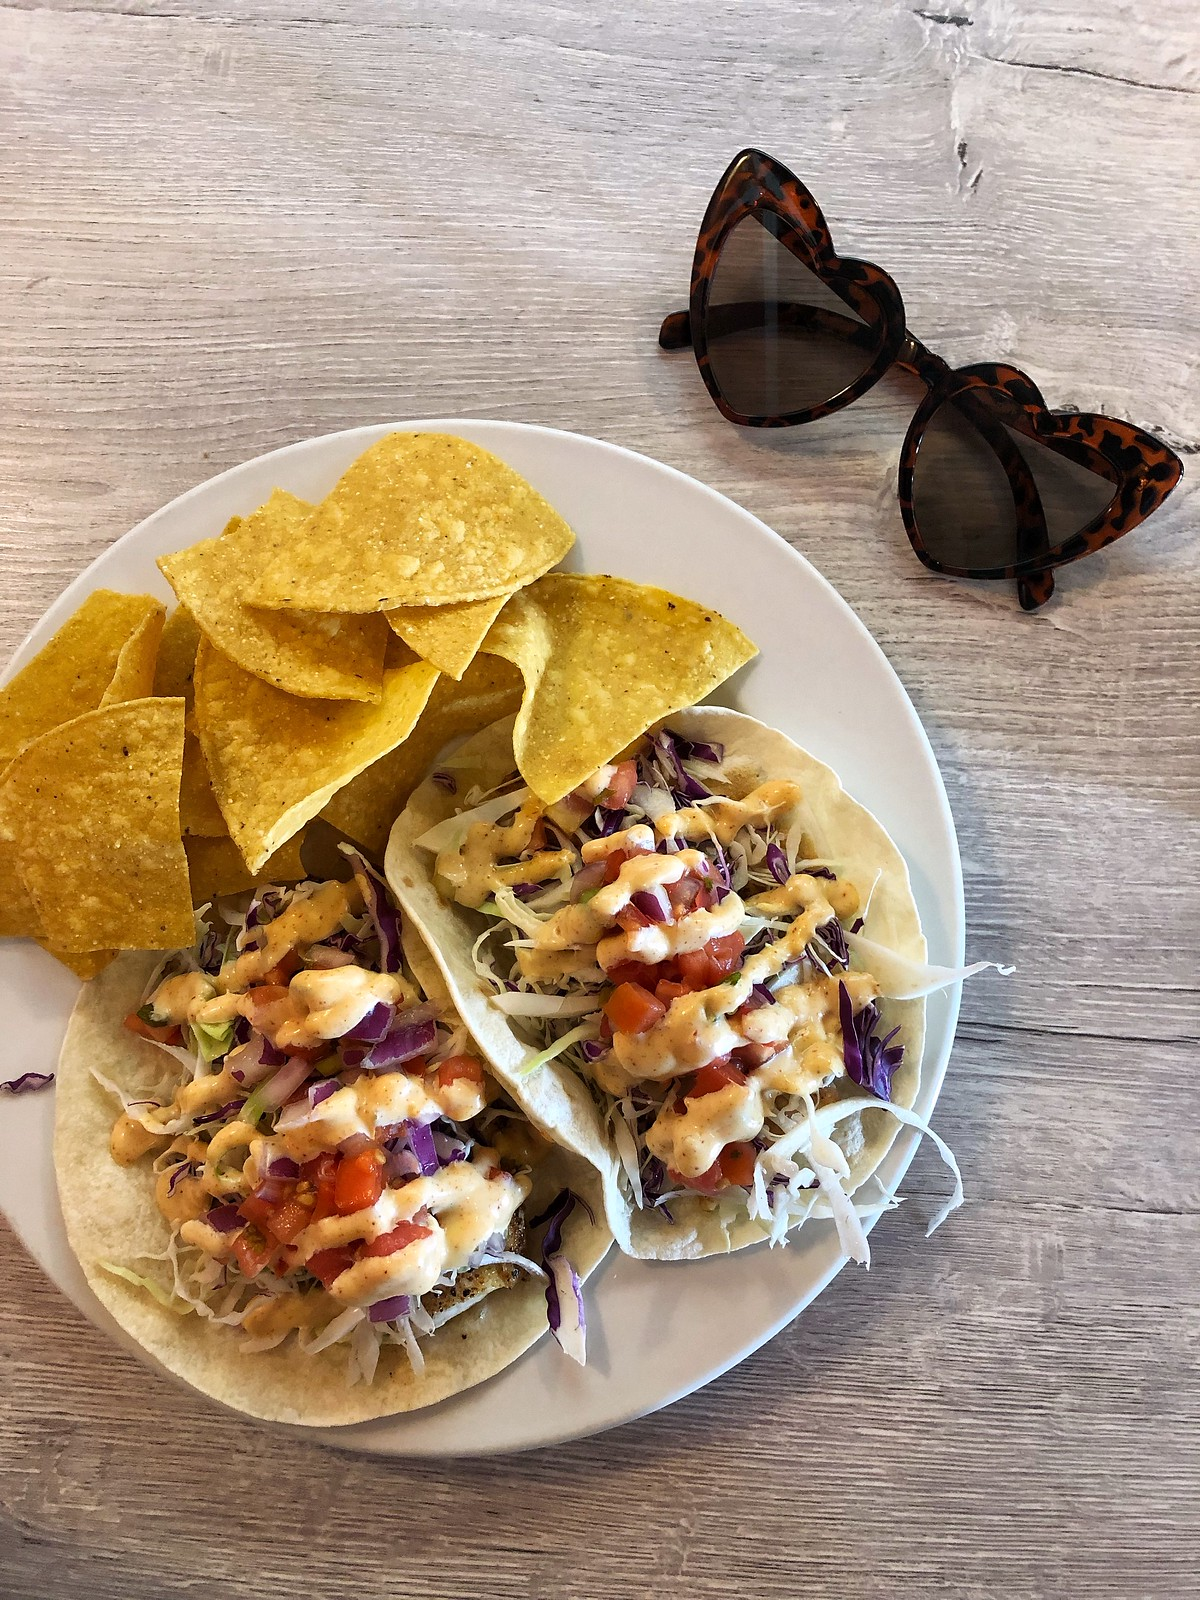 key-largo-conch-house-tacos-ultimate-road-trip-5-days-florida-keys-itinerary-what-to-do-key-west-key-largo-islamorada-marathon-miami-vacation-guide